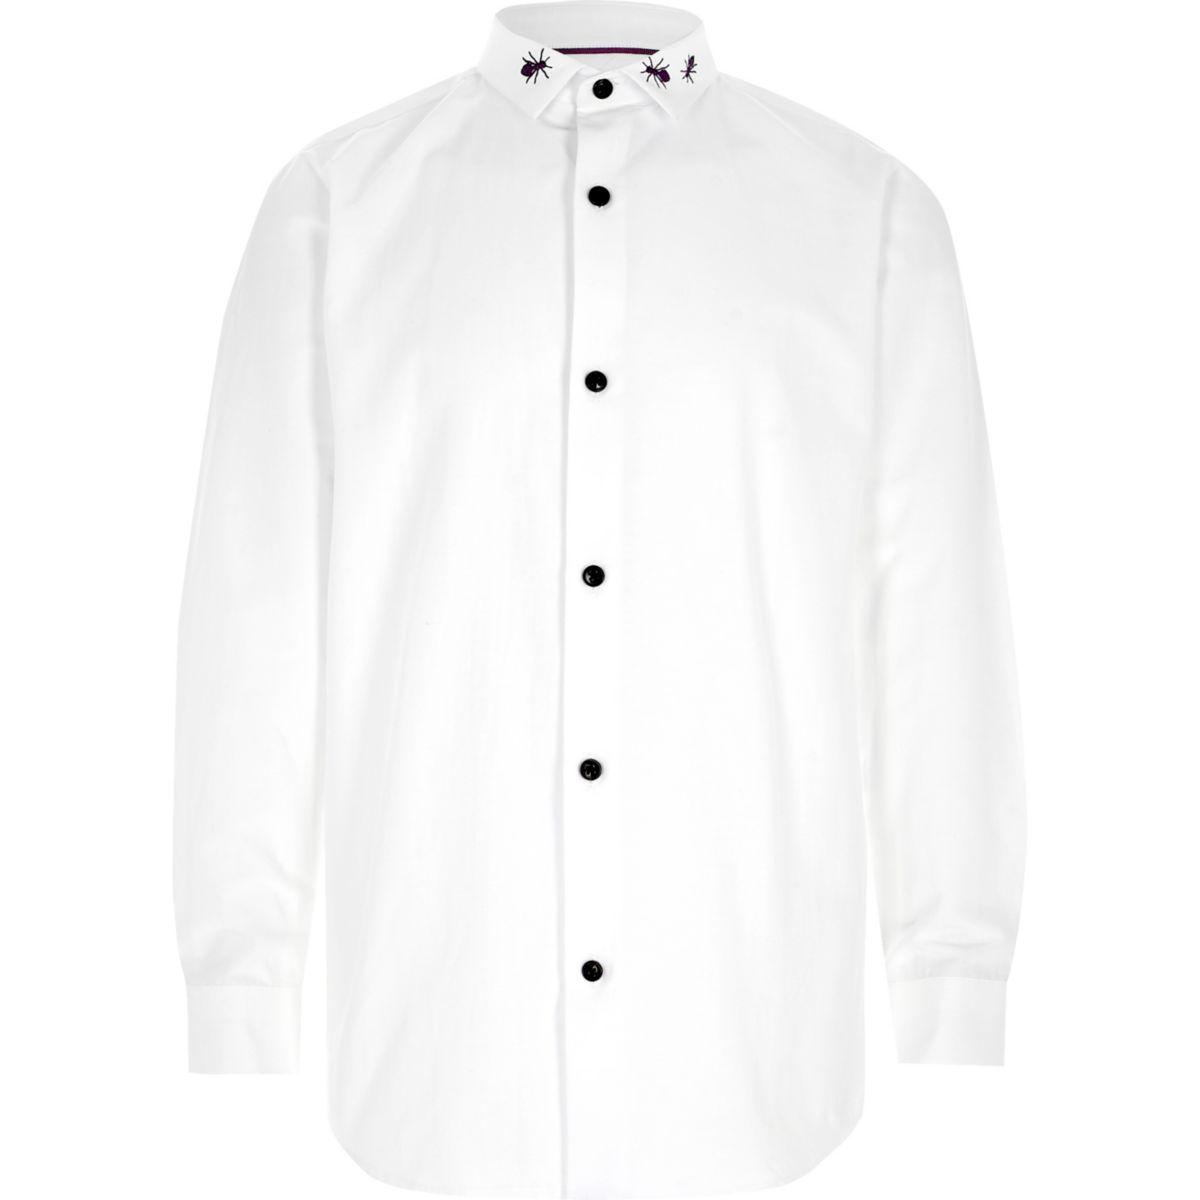 Boys white long sleeve bug collar shirt